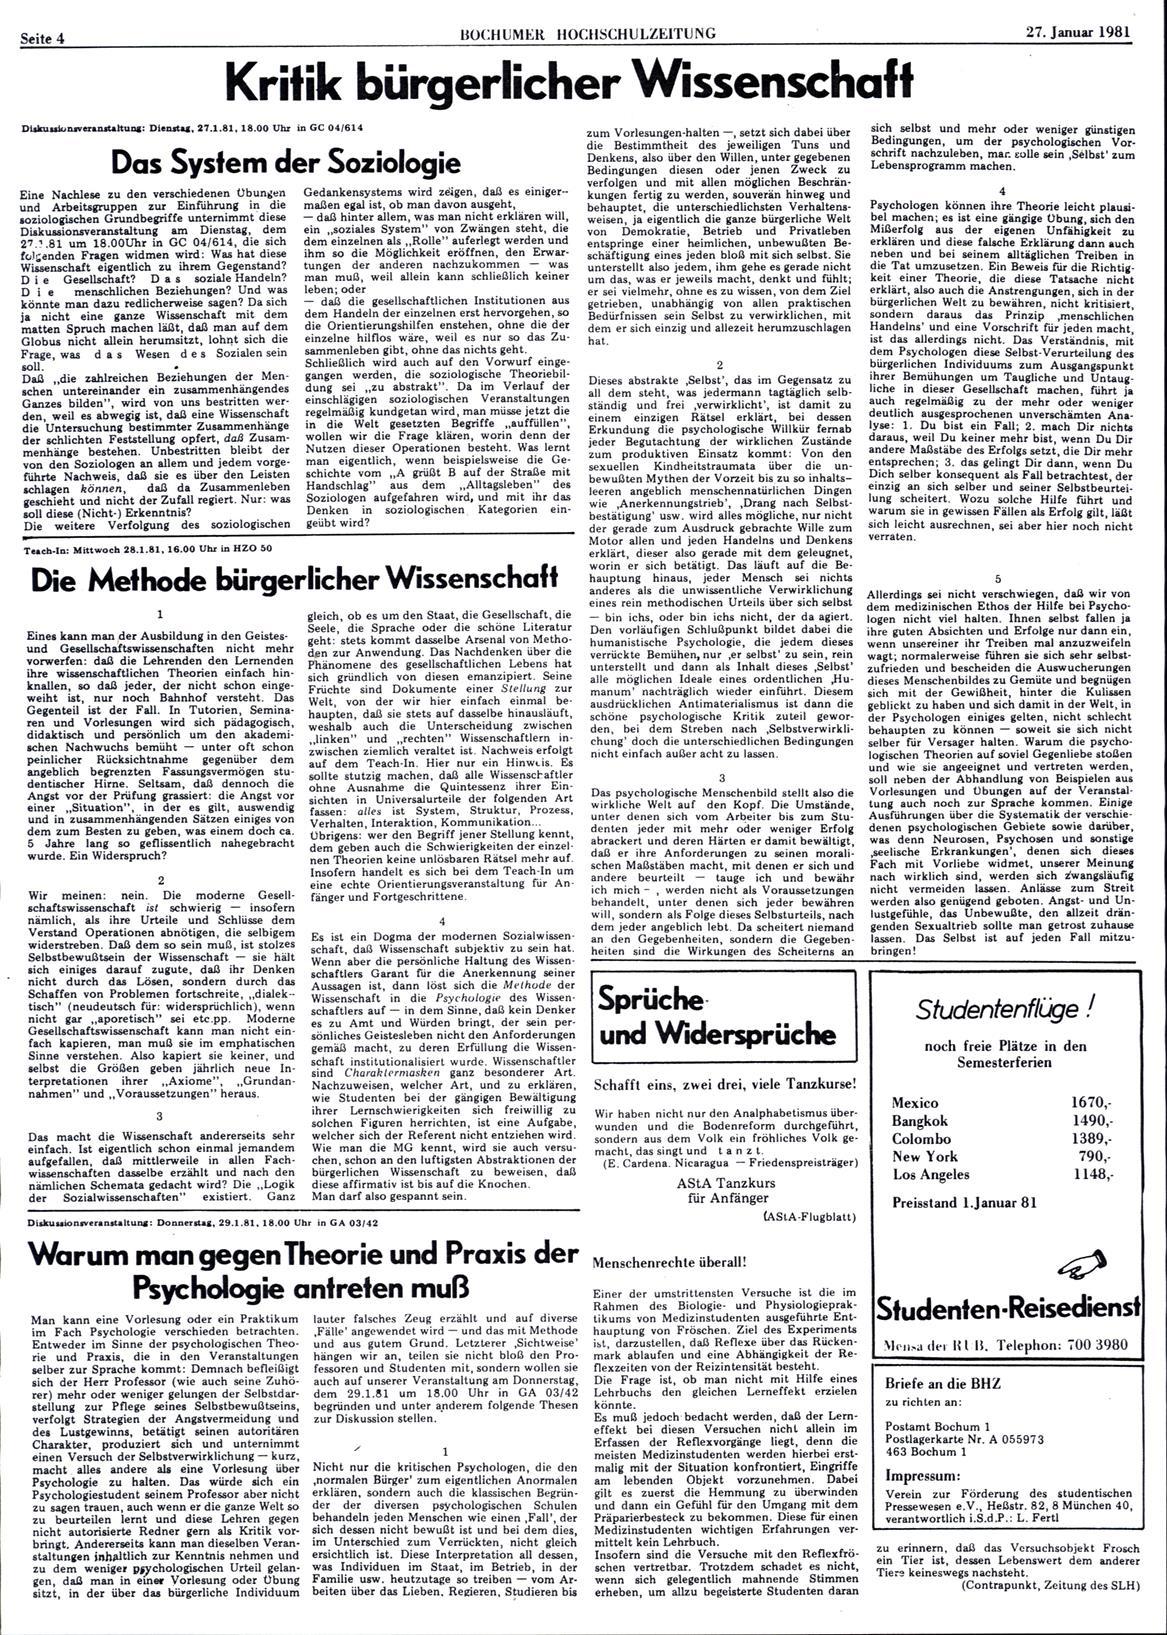 Bochum_BHZ_19810127_026_004